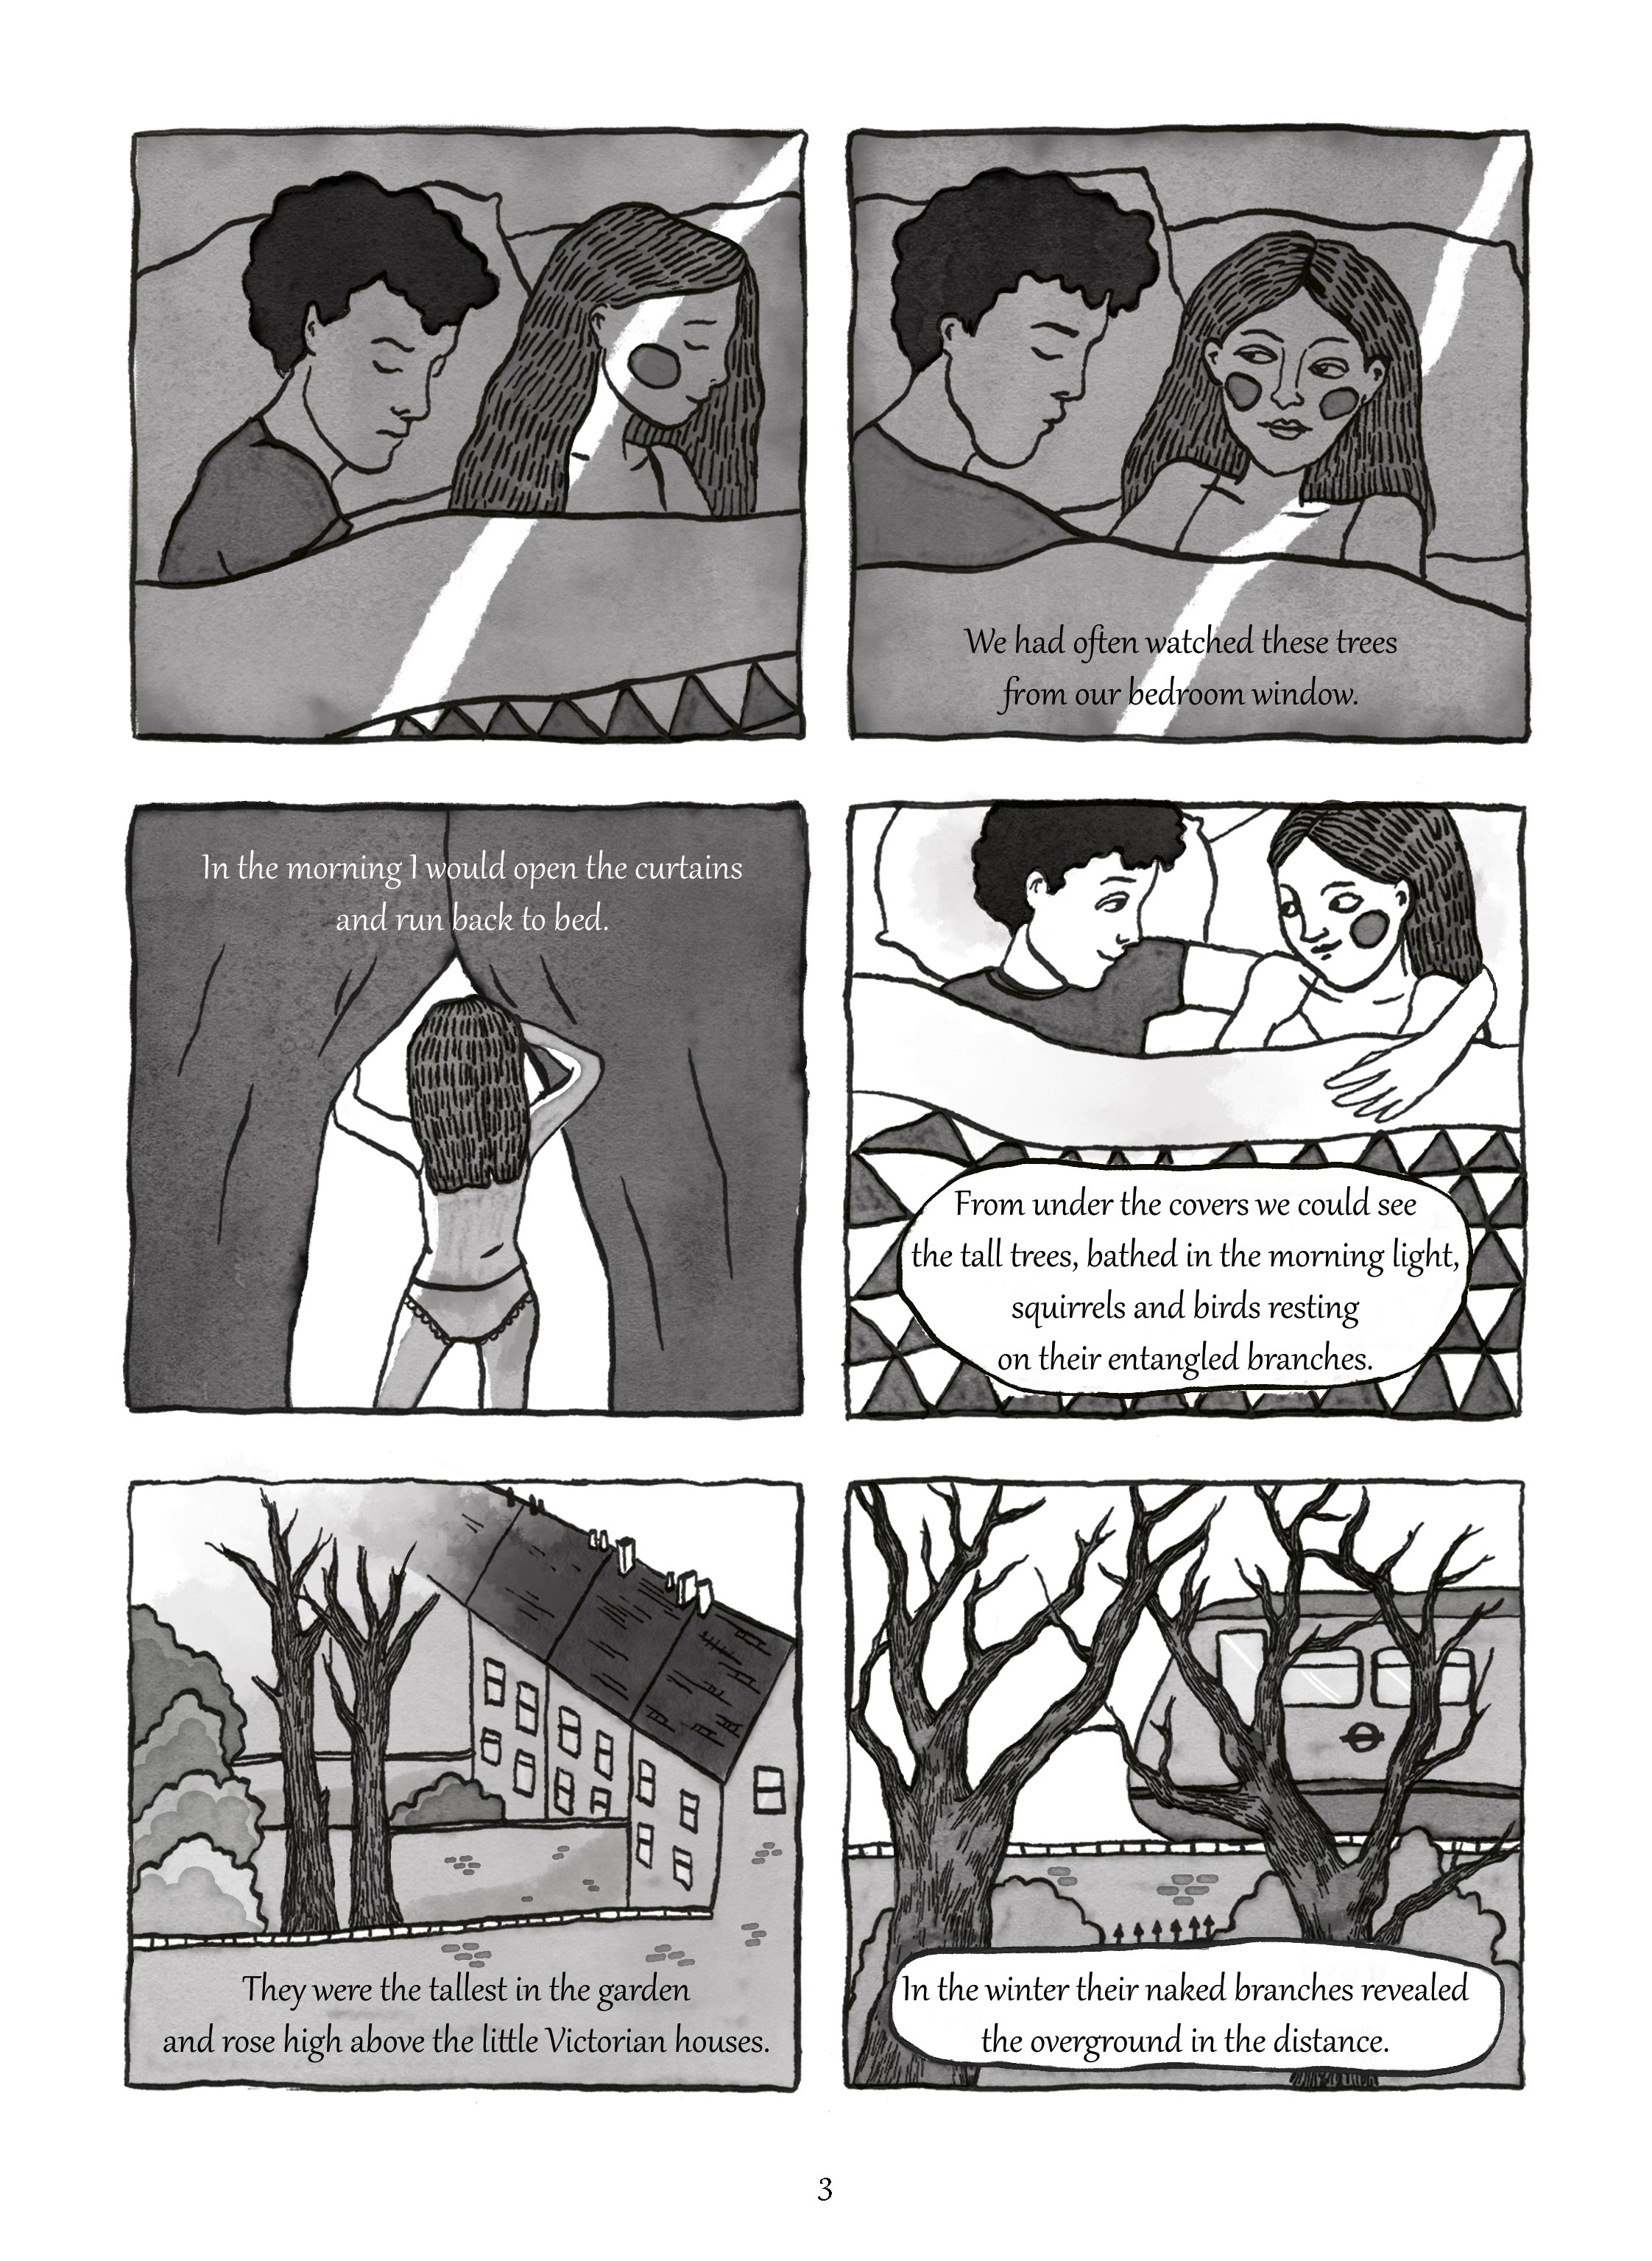 Marie-de-Beaucourt-Illustration-Two-Trees-Graphic-Novel-page3.jpg